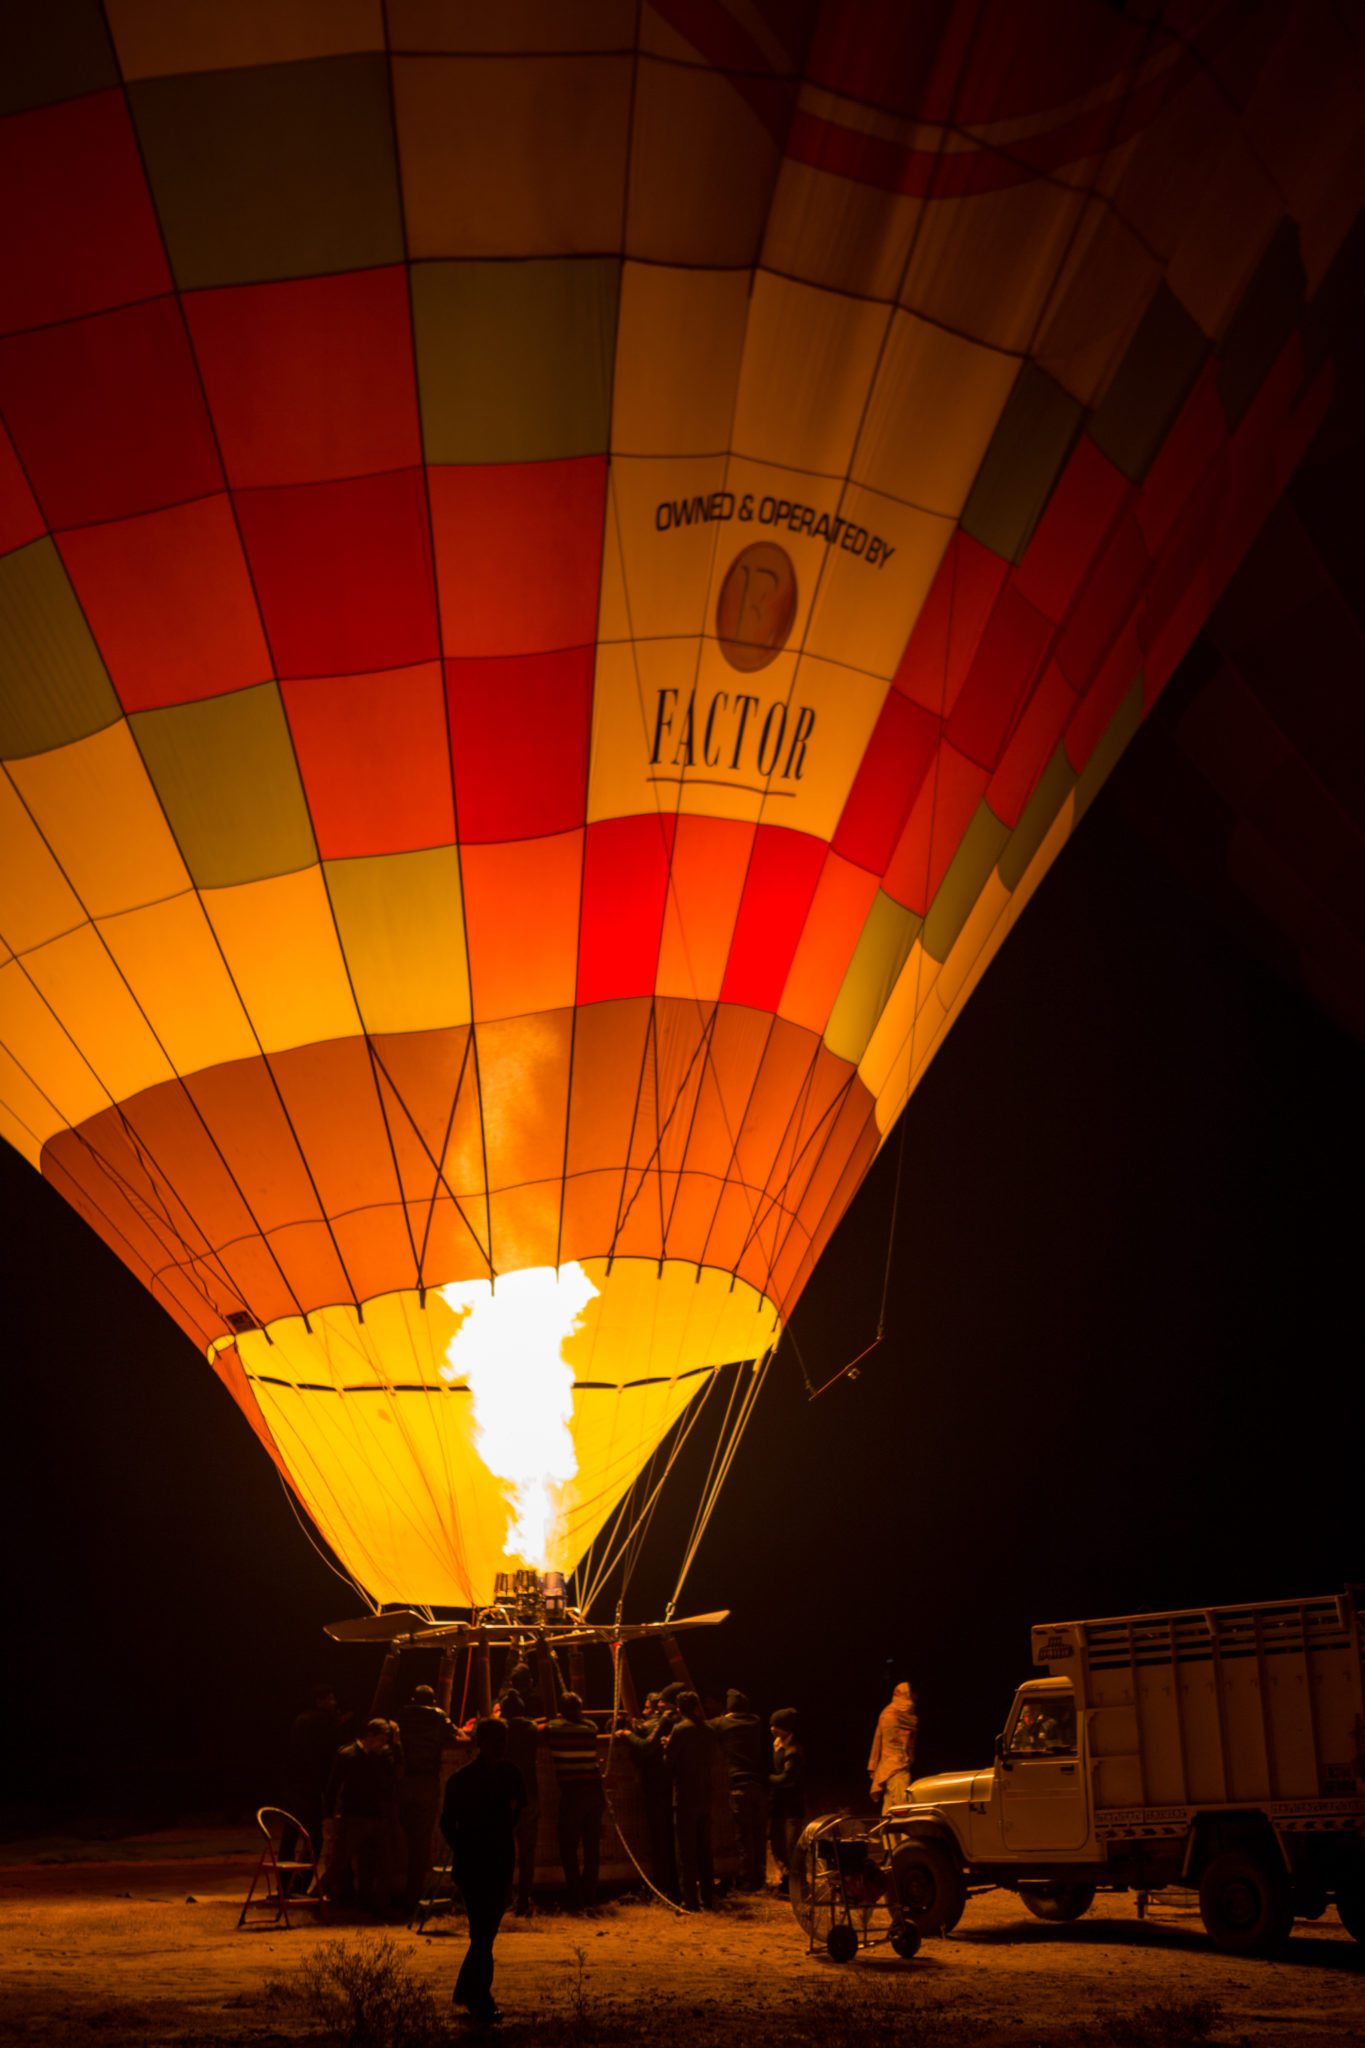 air-balloon-montgolfiere-jaipur-rajasthan-inde